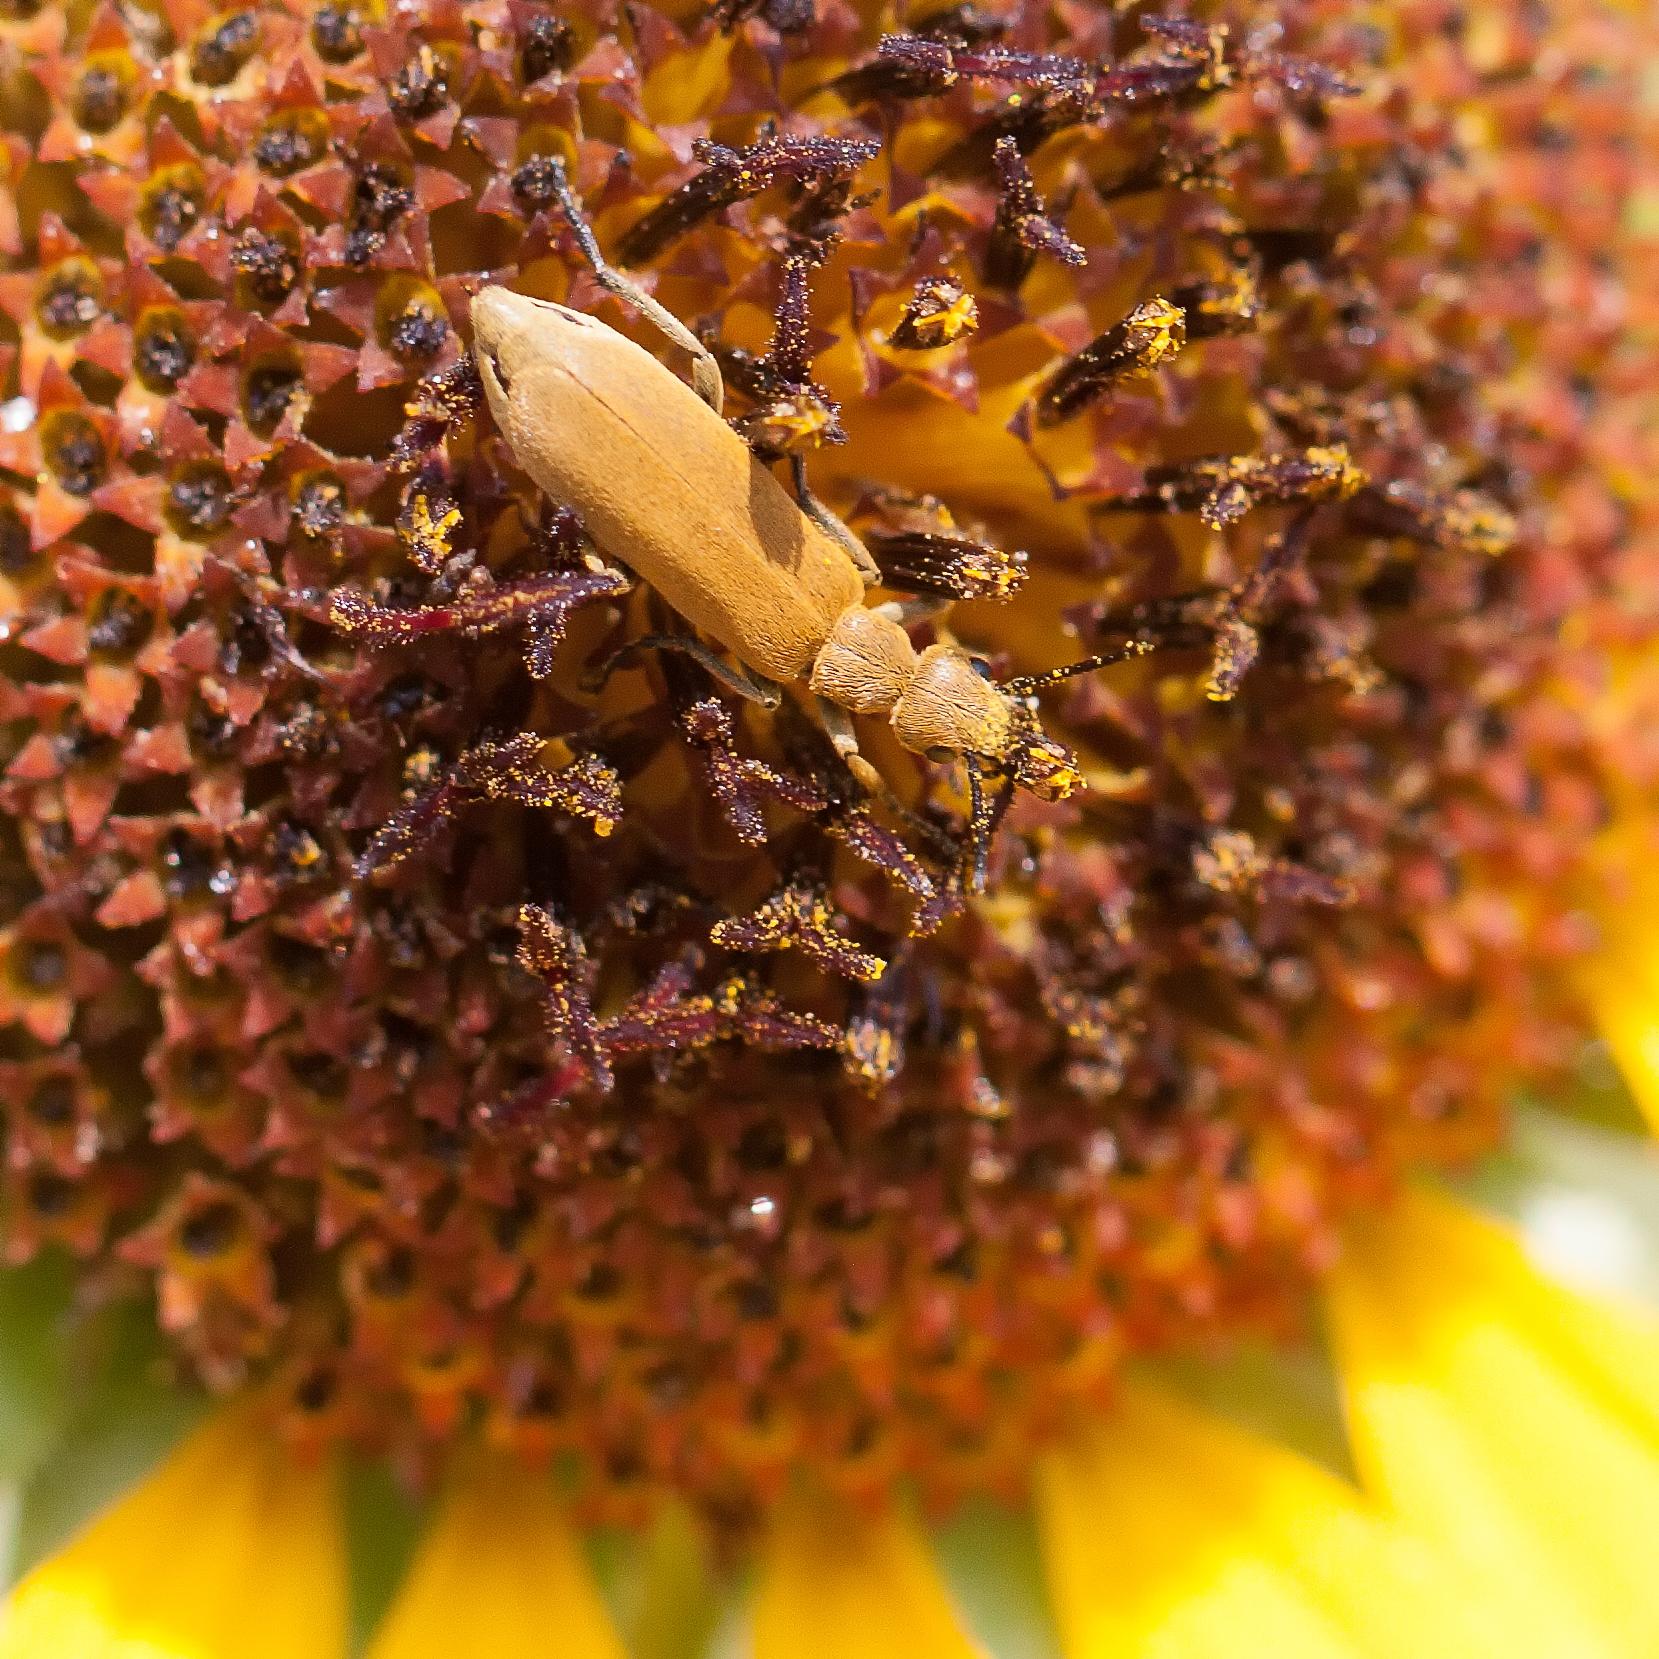 Pollinator-36